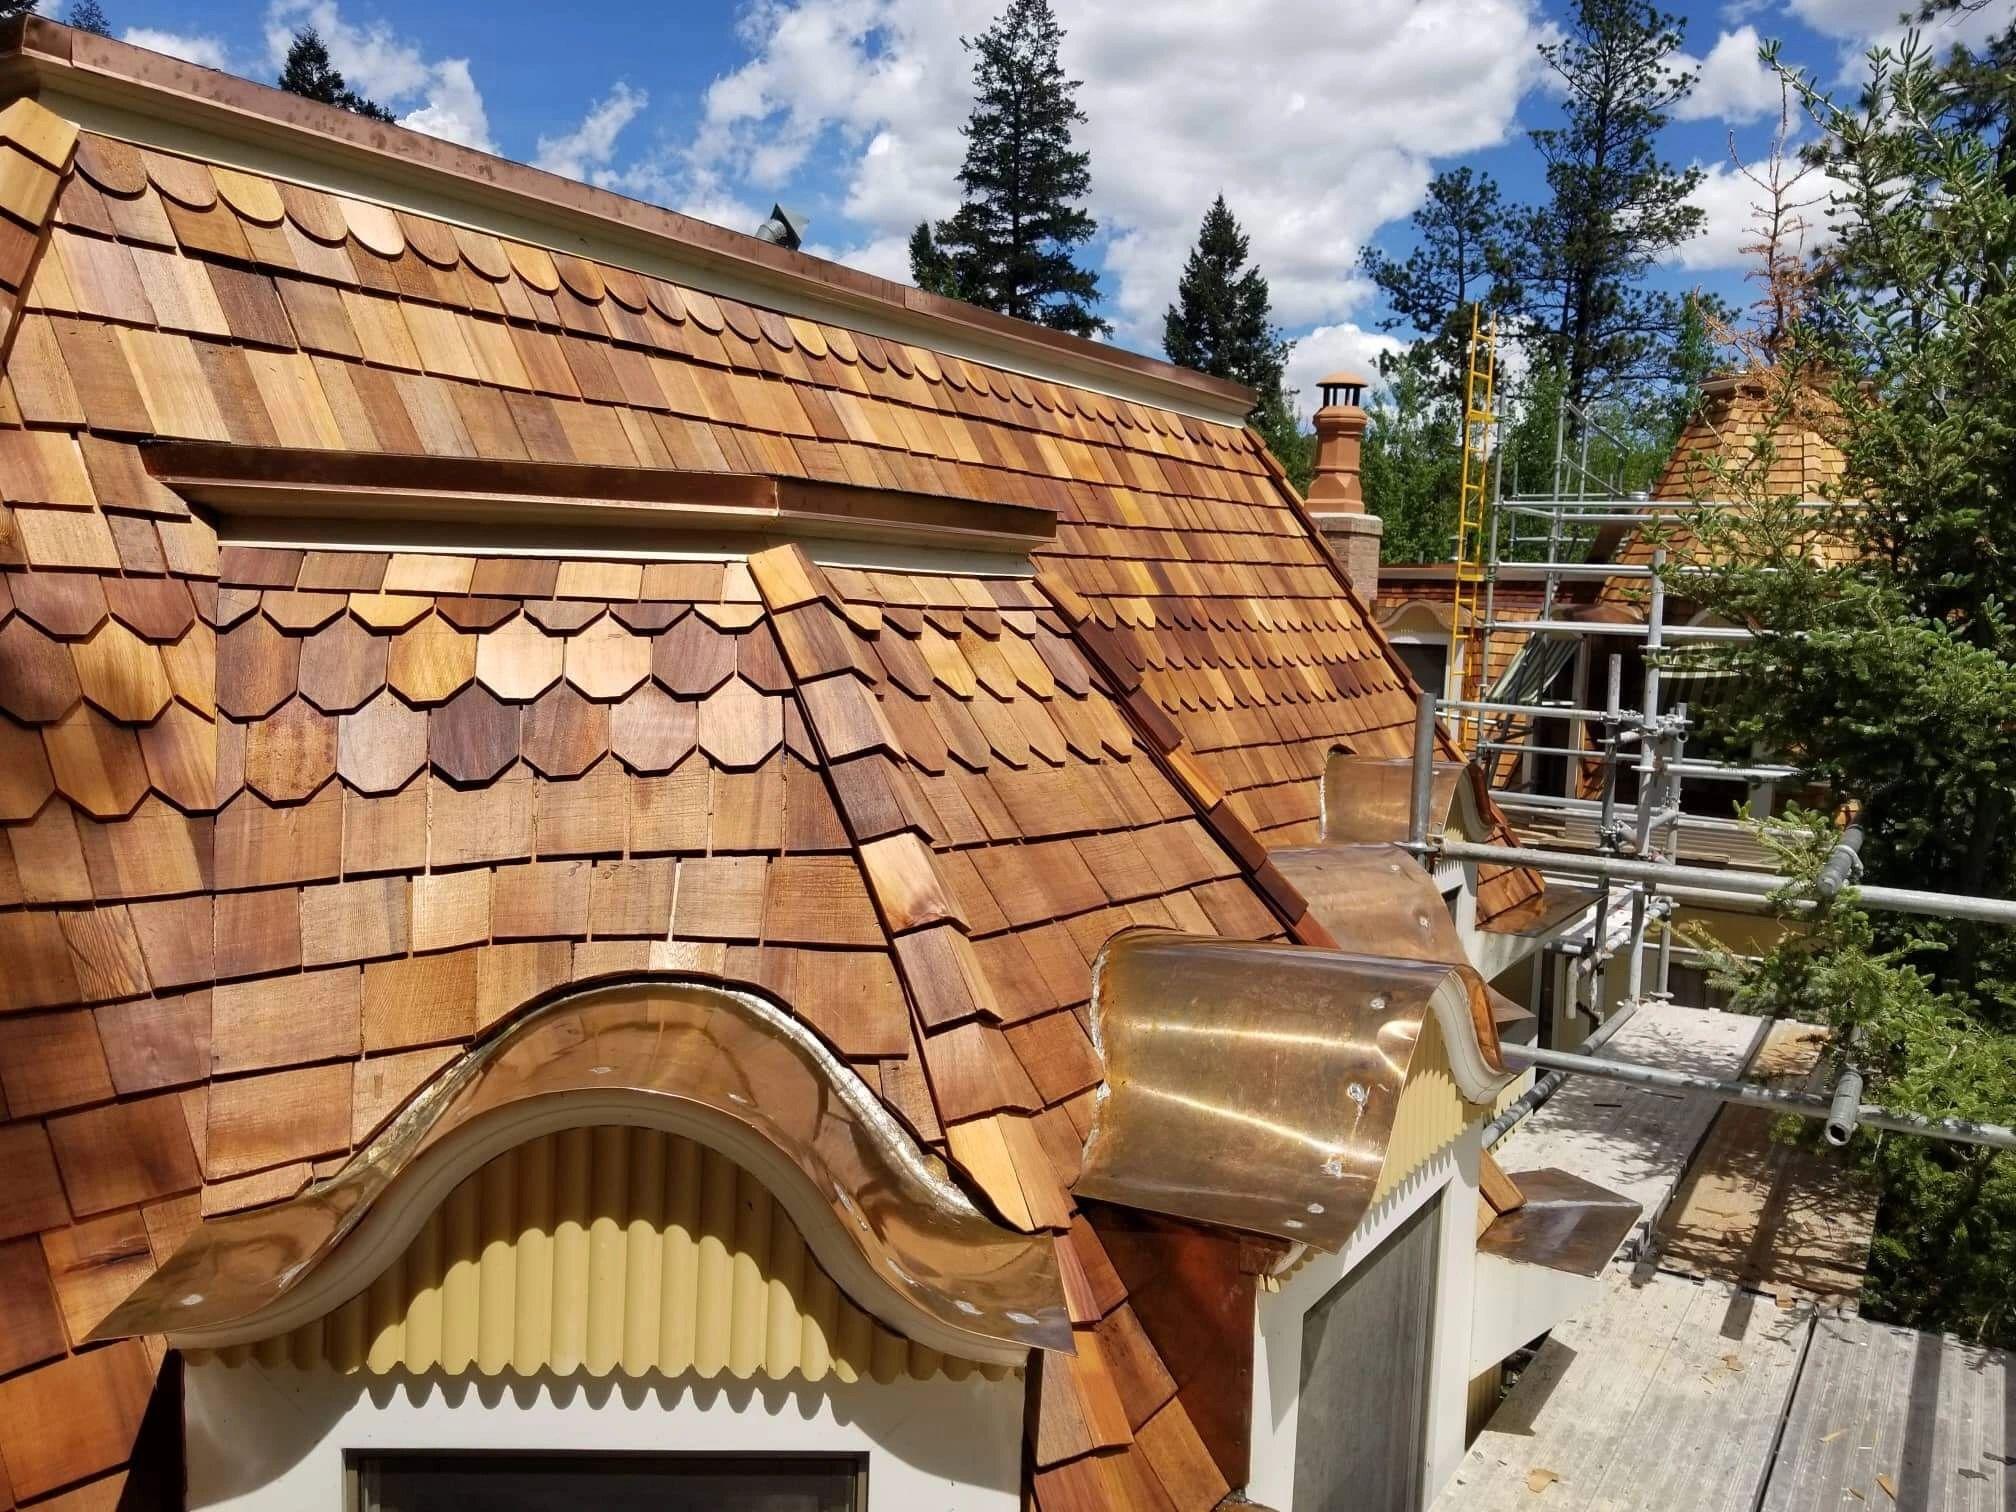 Acs Alliance Construction Service Storm Damage Repair Roofing